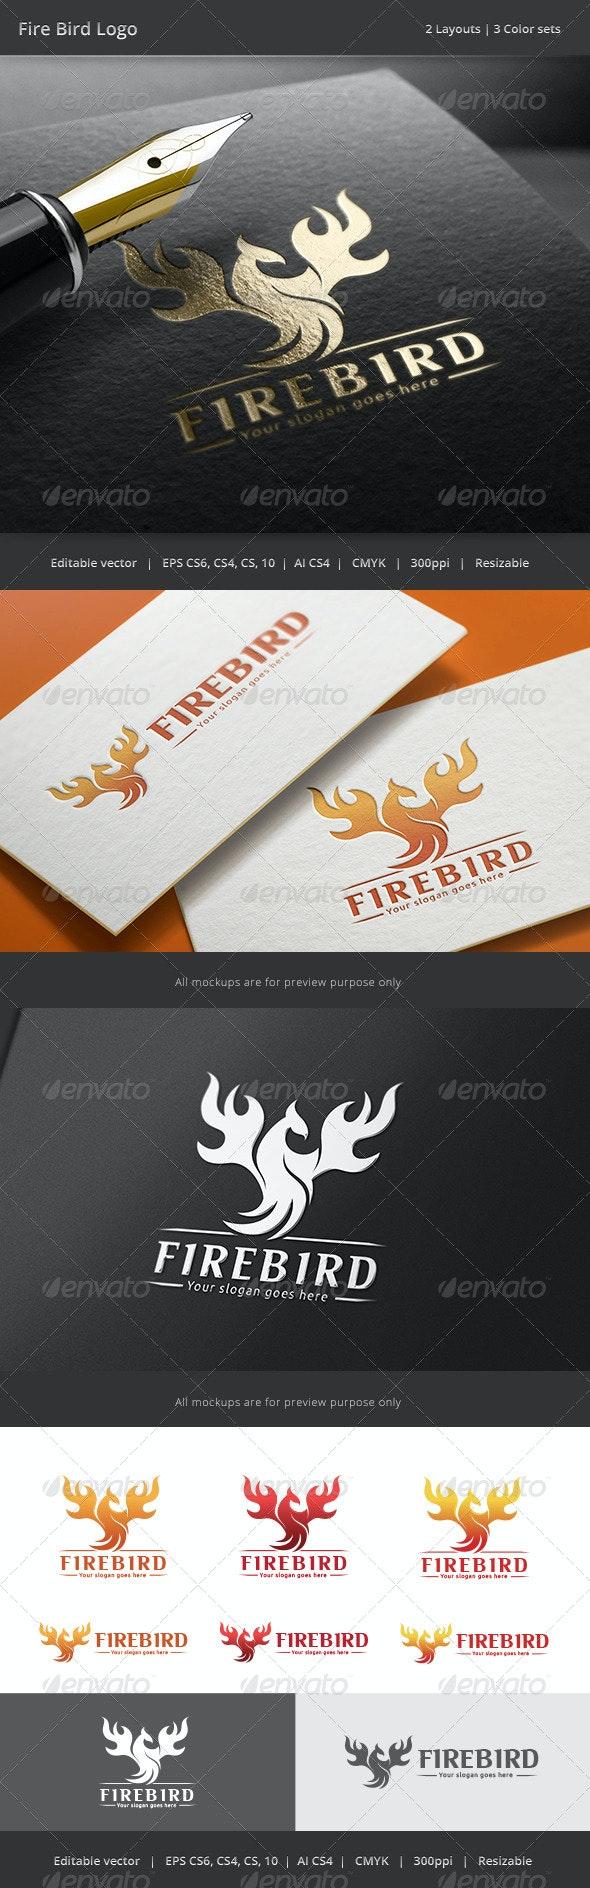 Fire Bird Logo v1 - Animals Logo Templates